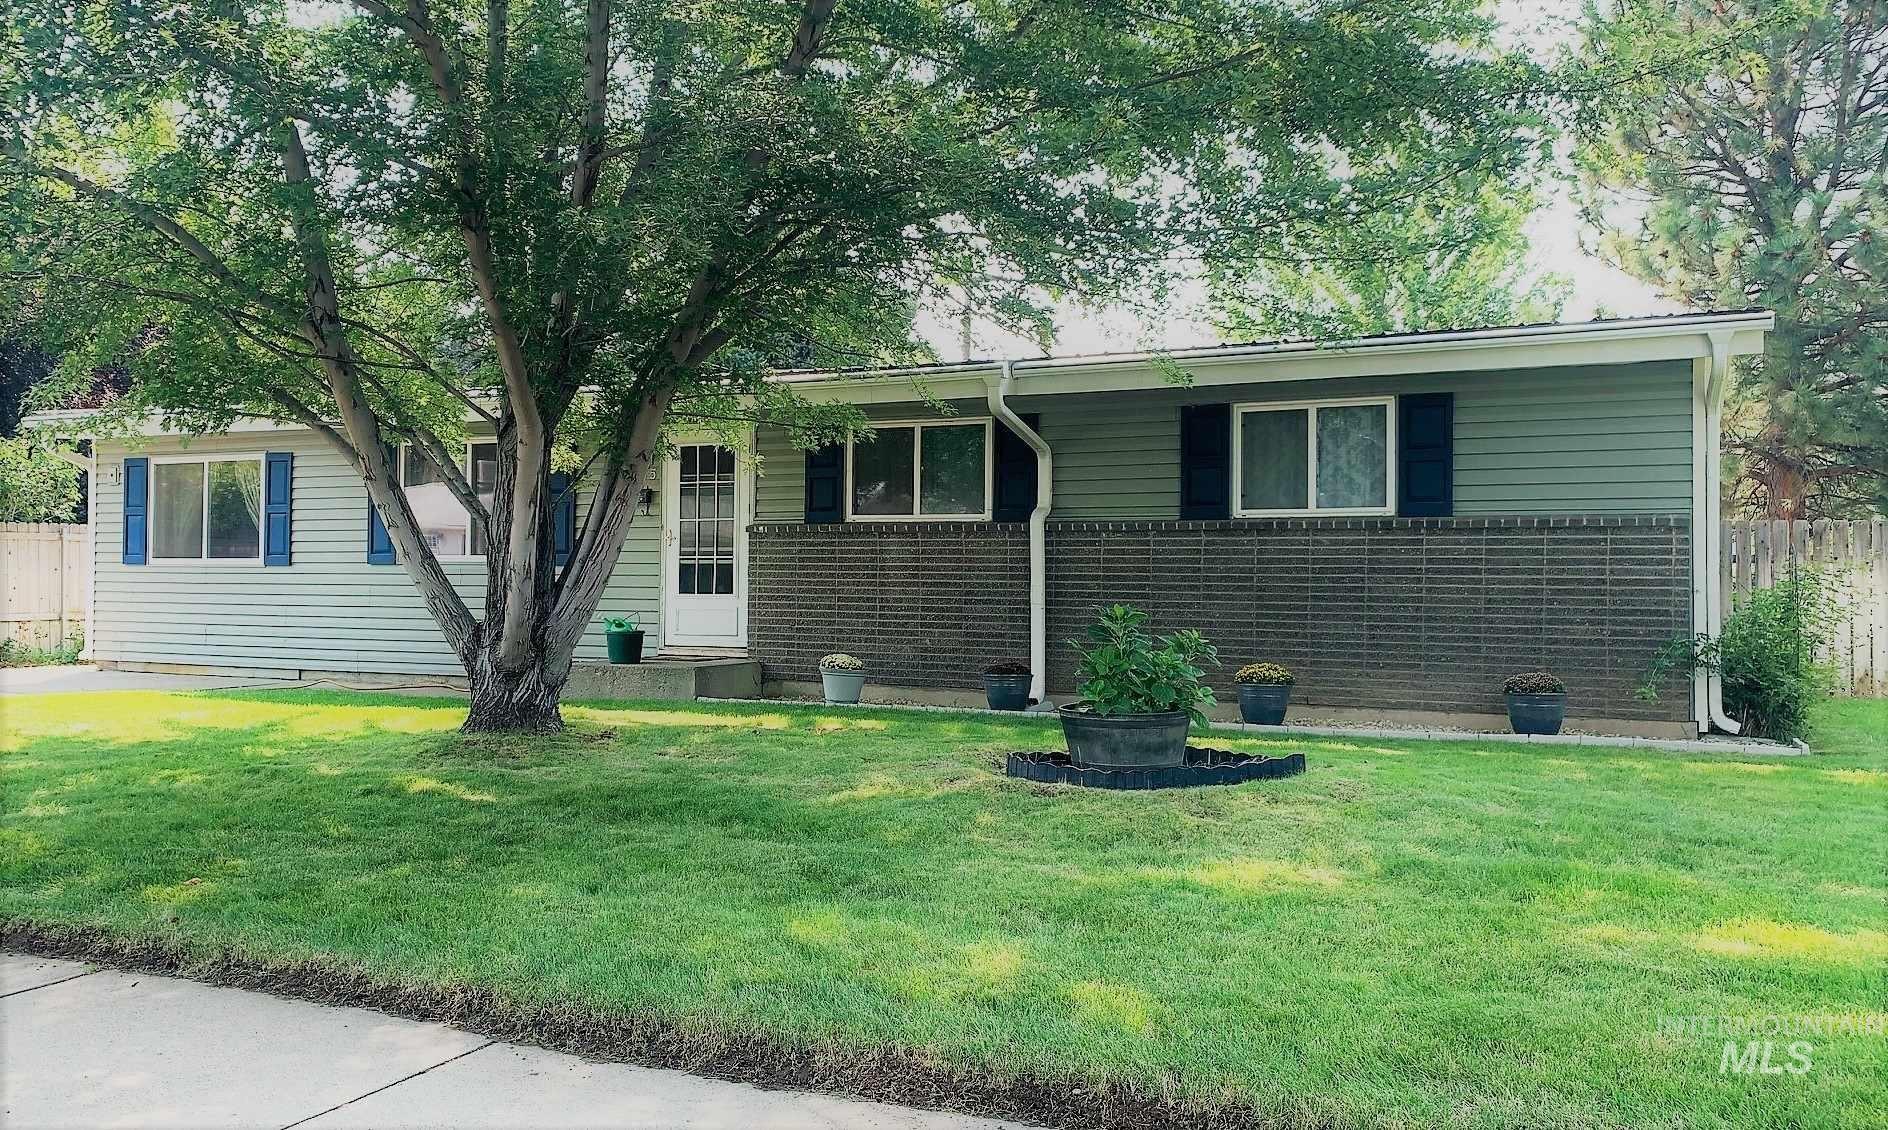 585 Phelps Circle, Mountain Home, ID 83647 - MLS#: 98779010